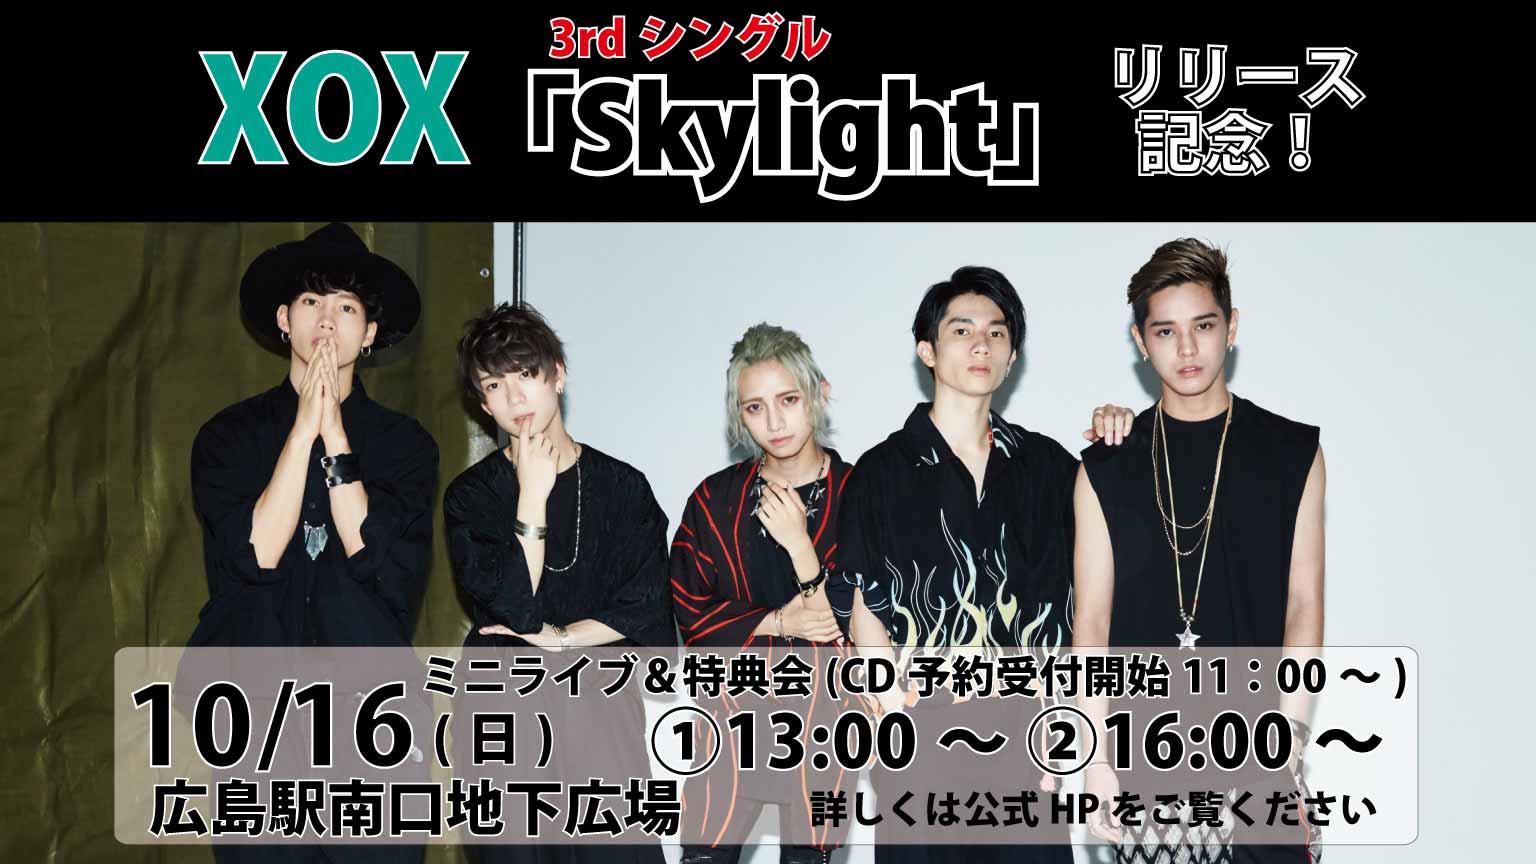 【XOX】3rdシングル『Skylight』リリース記念!